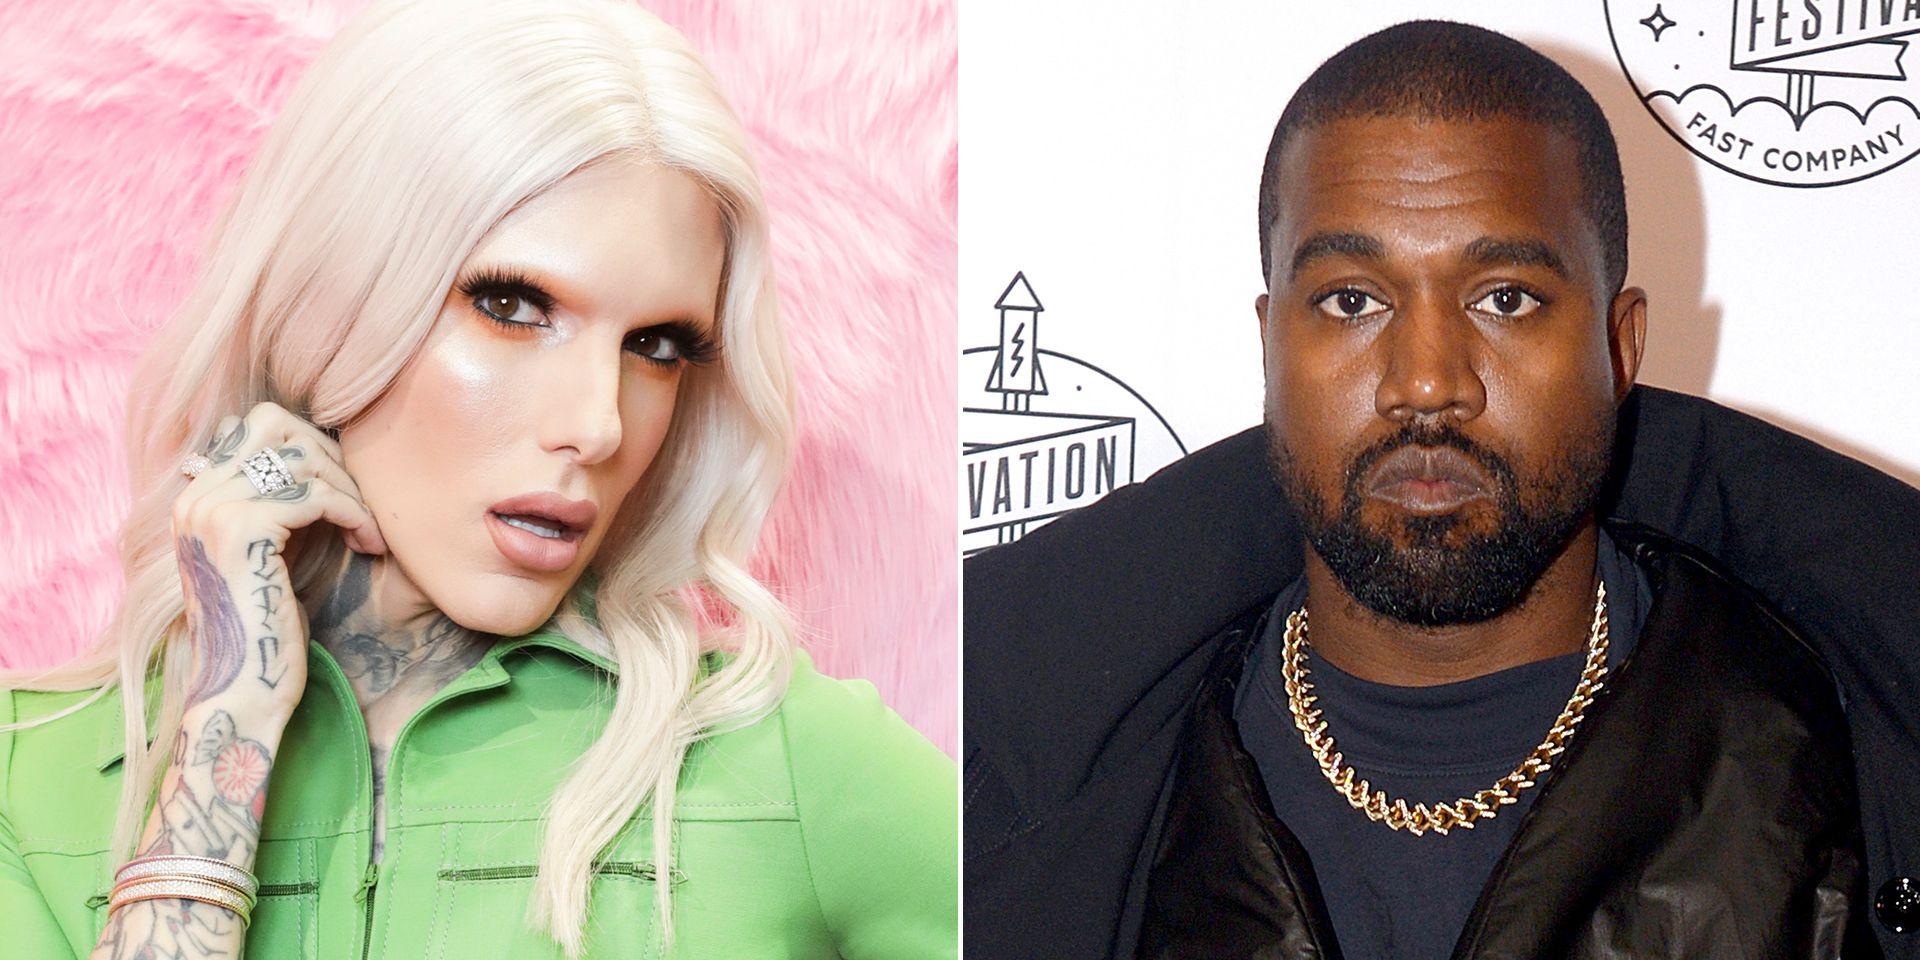 Jeffree Star References Kanye West Affair Rumors Amid Divorce Reports